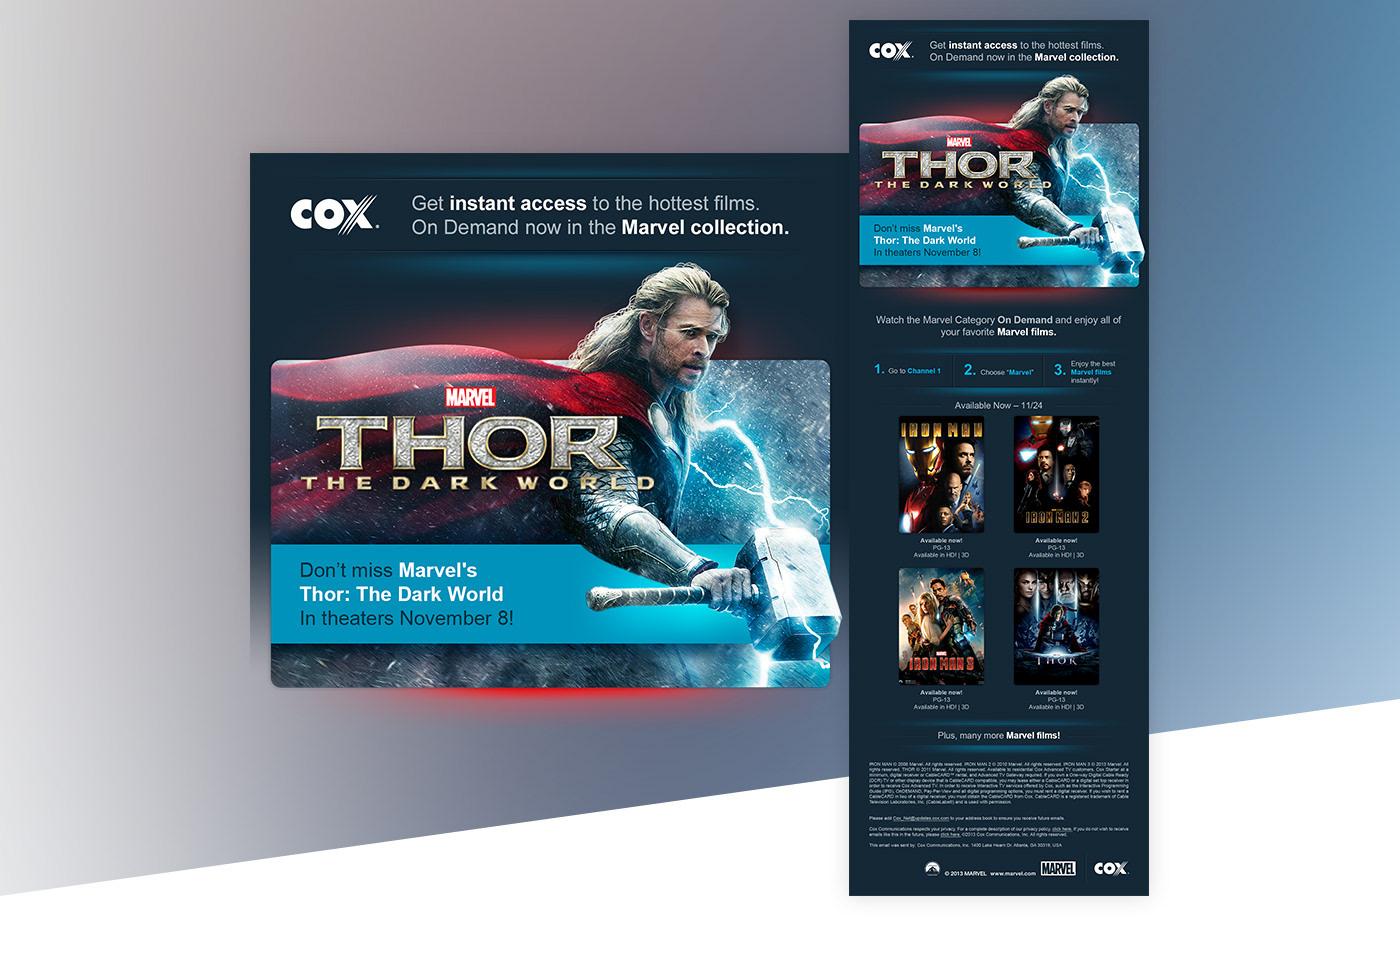 Email newsletter spectrum dish network marvel Cox OnDemand marketing   Movies